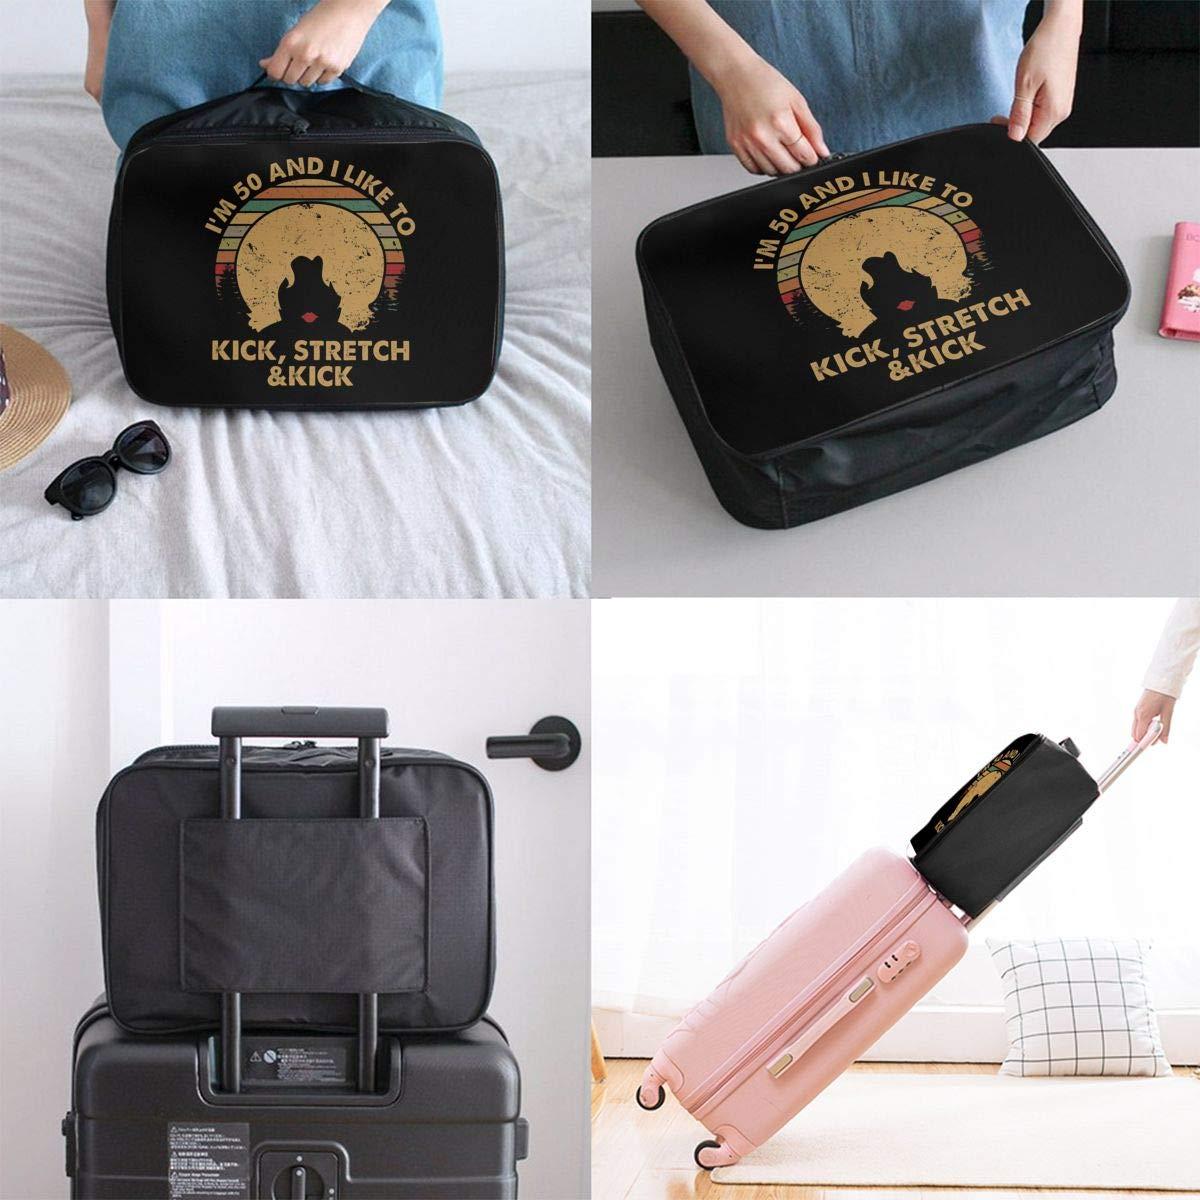 Fretlo Im 50 Kick Stretch And Kick Travel Duffel Bag Waterproof Lightweight Large Capacity Portable Luggage Bag Black